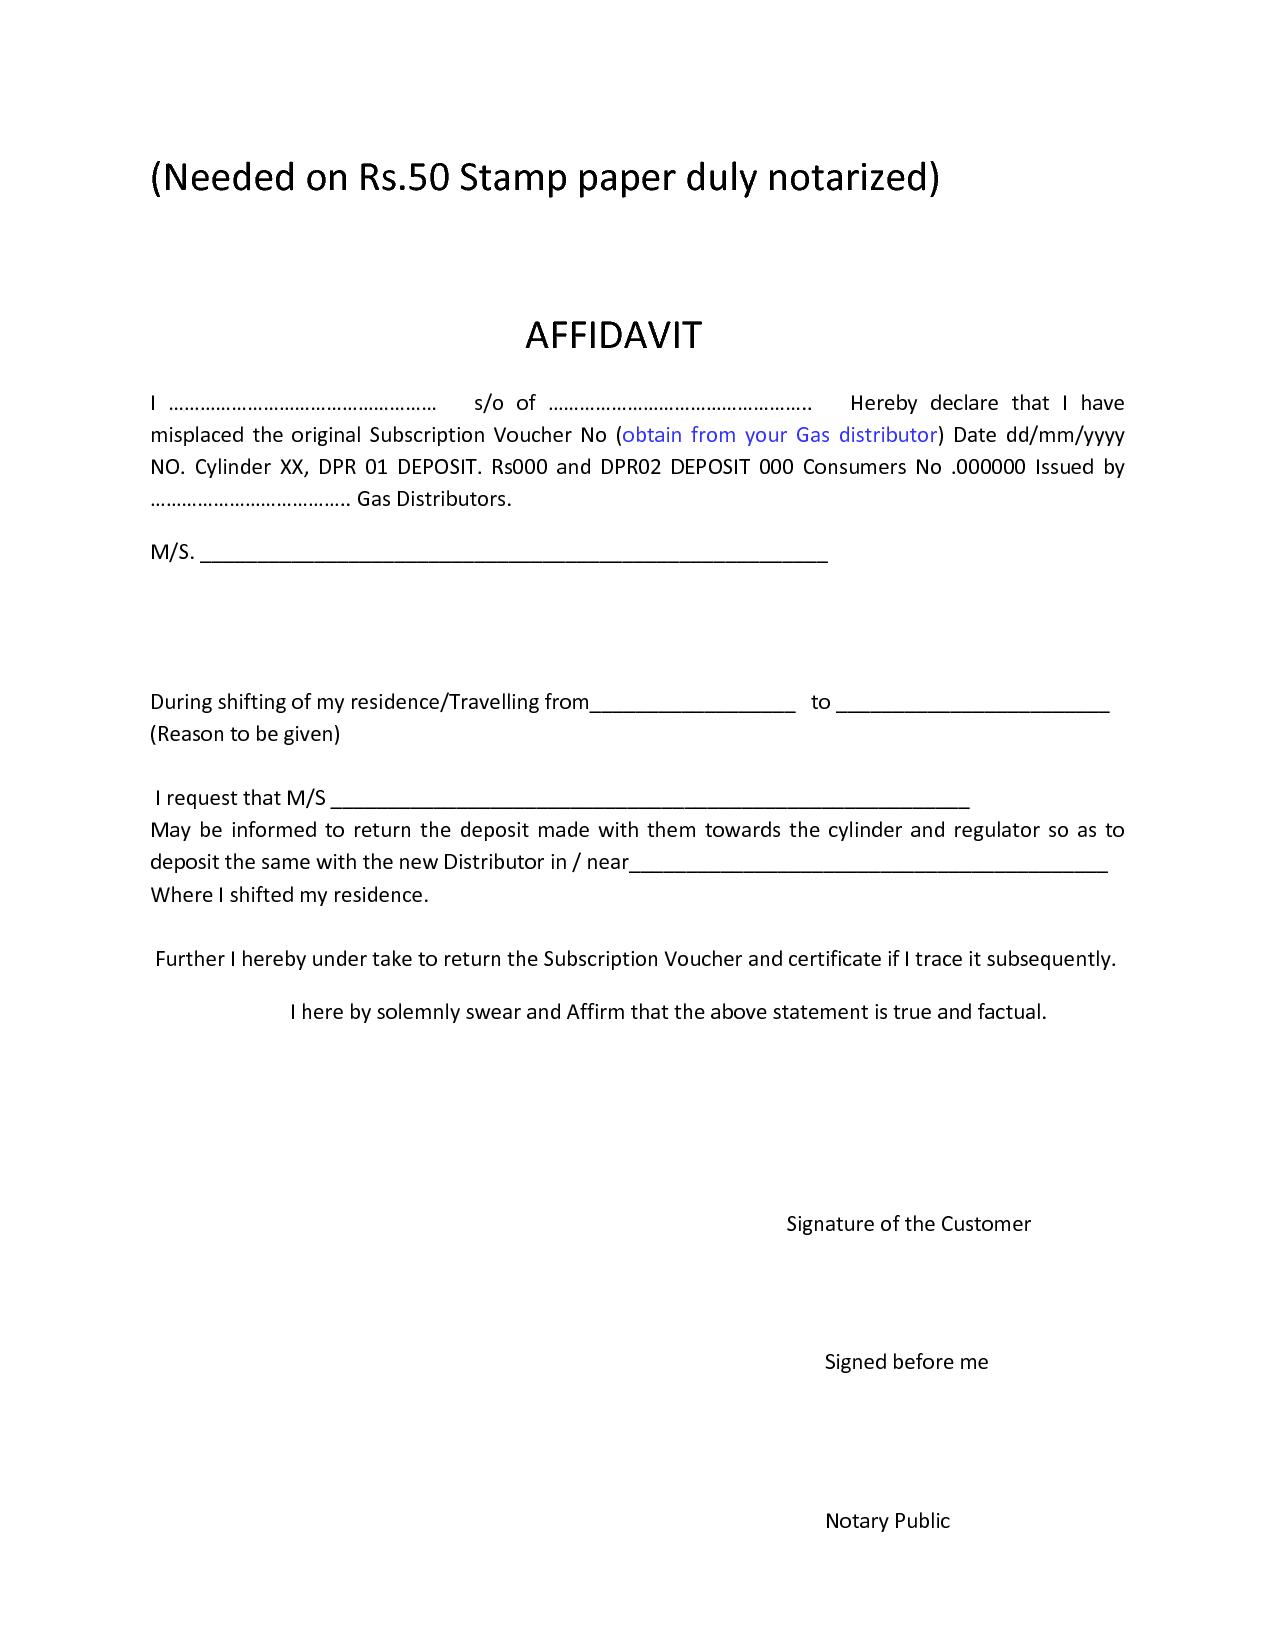 Download Affidavit Form for free Page includes various formats of – Free Affidavit Forms Online